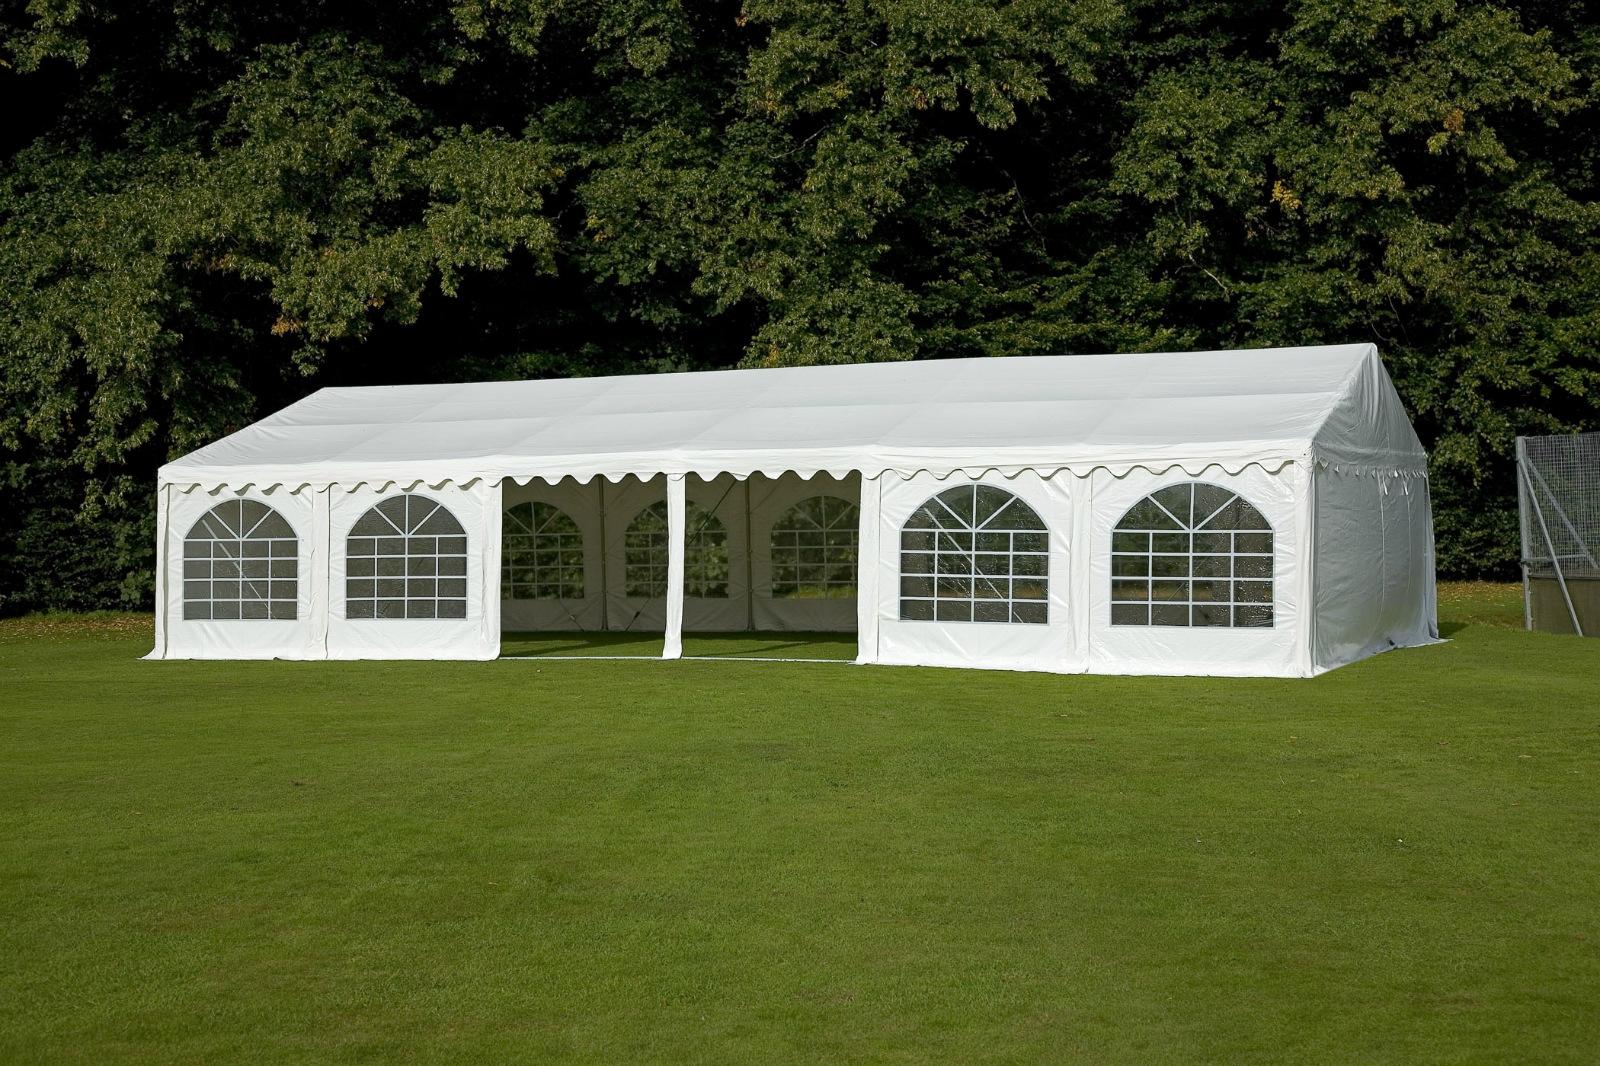 Pvc Combi Tent 40 X20 Heavy Duty Party Wedding Tents